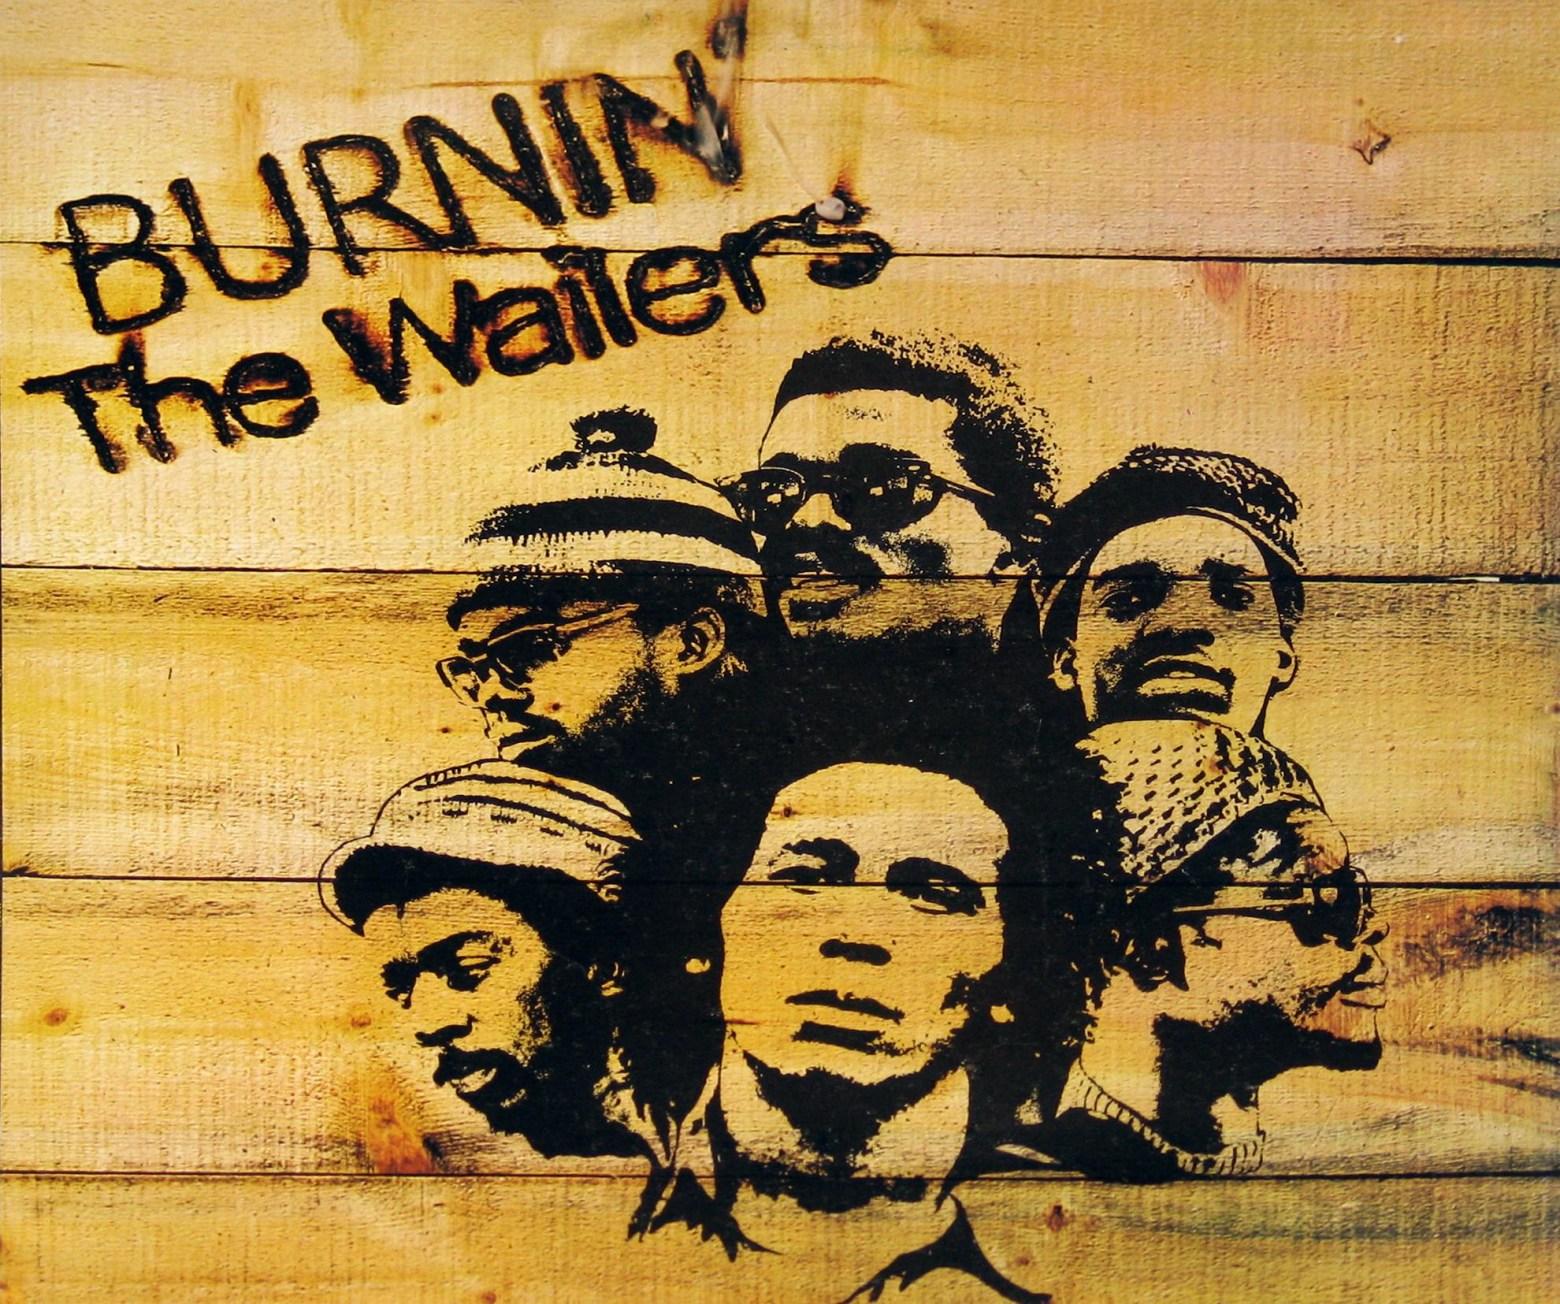 The Wailers – Burnin' – Album Cover